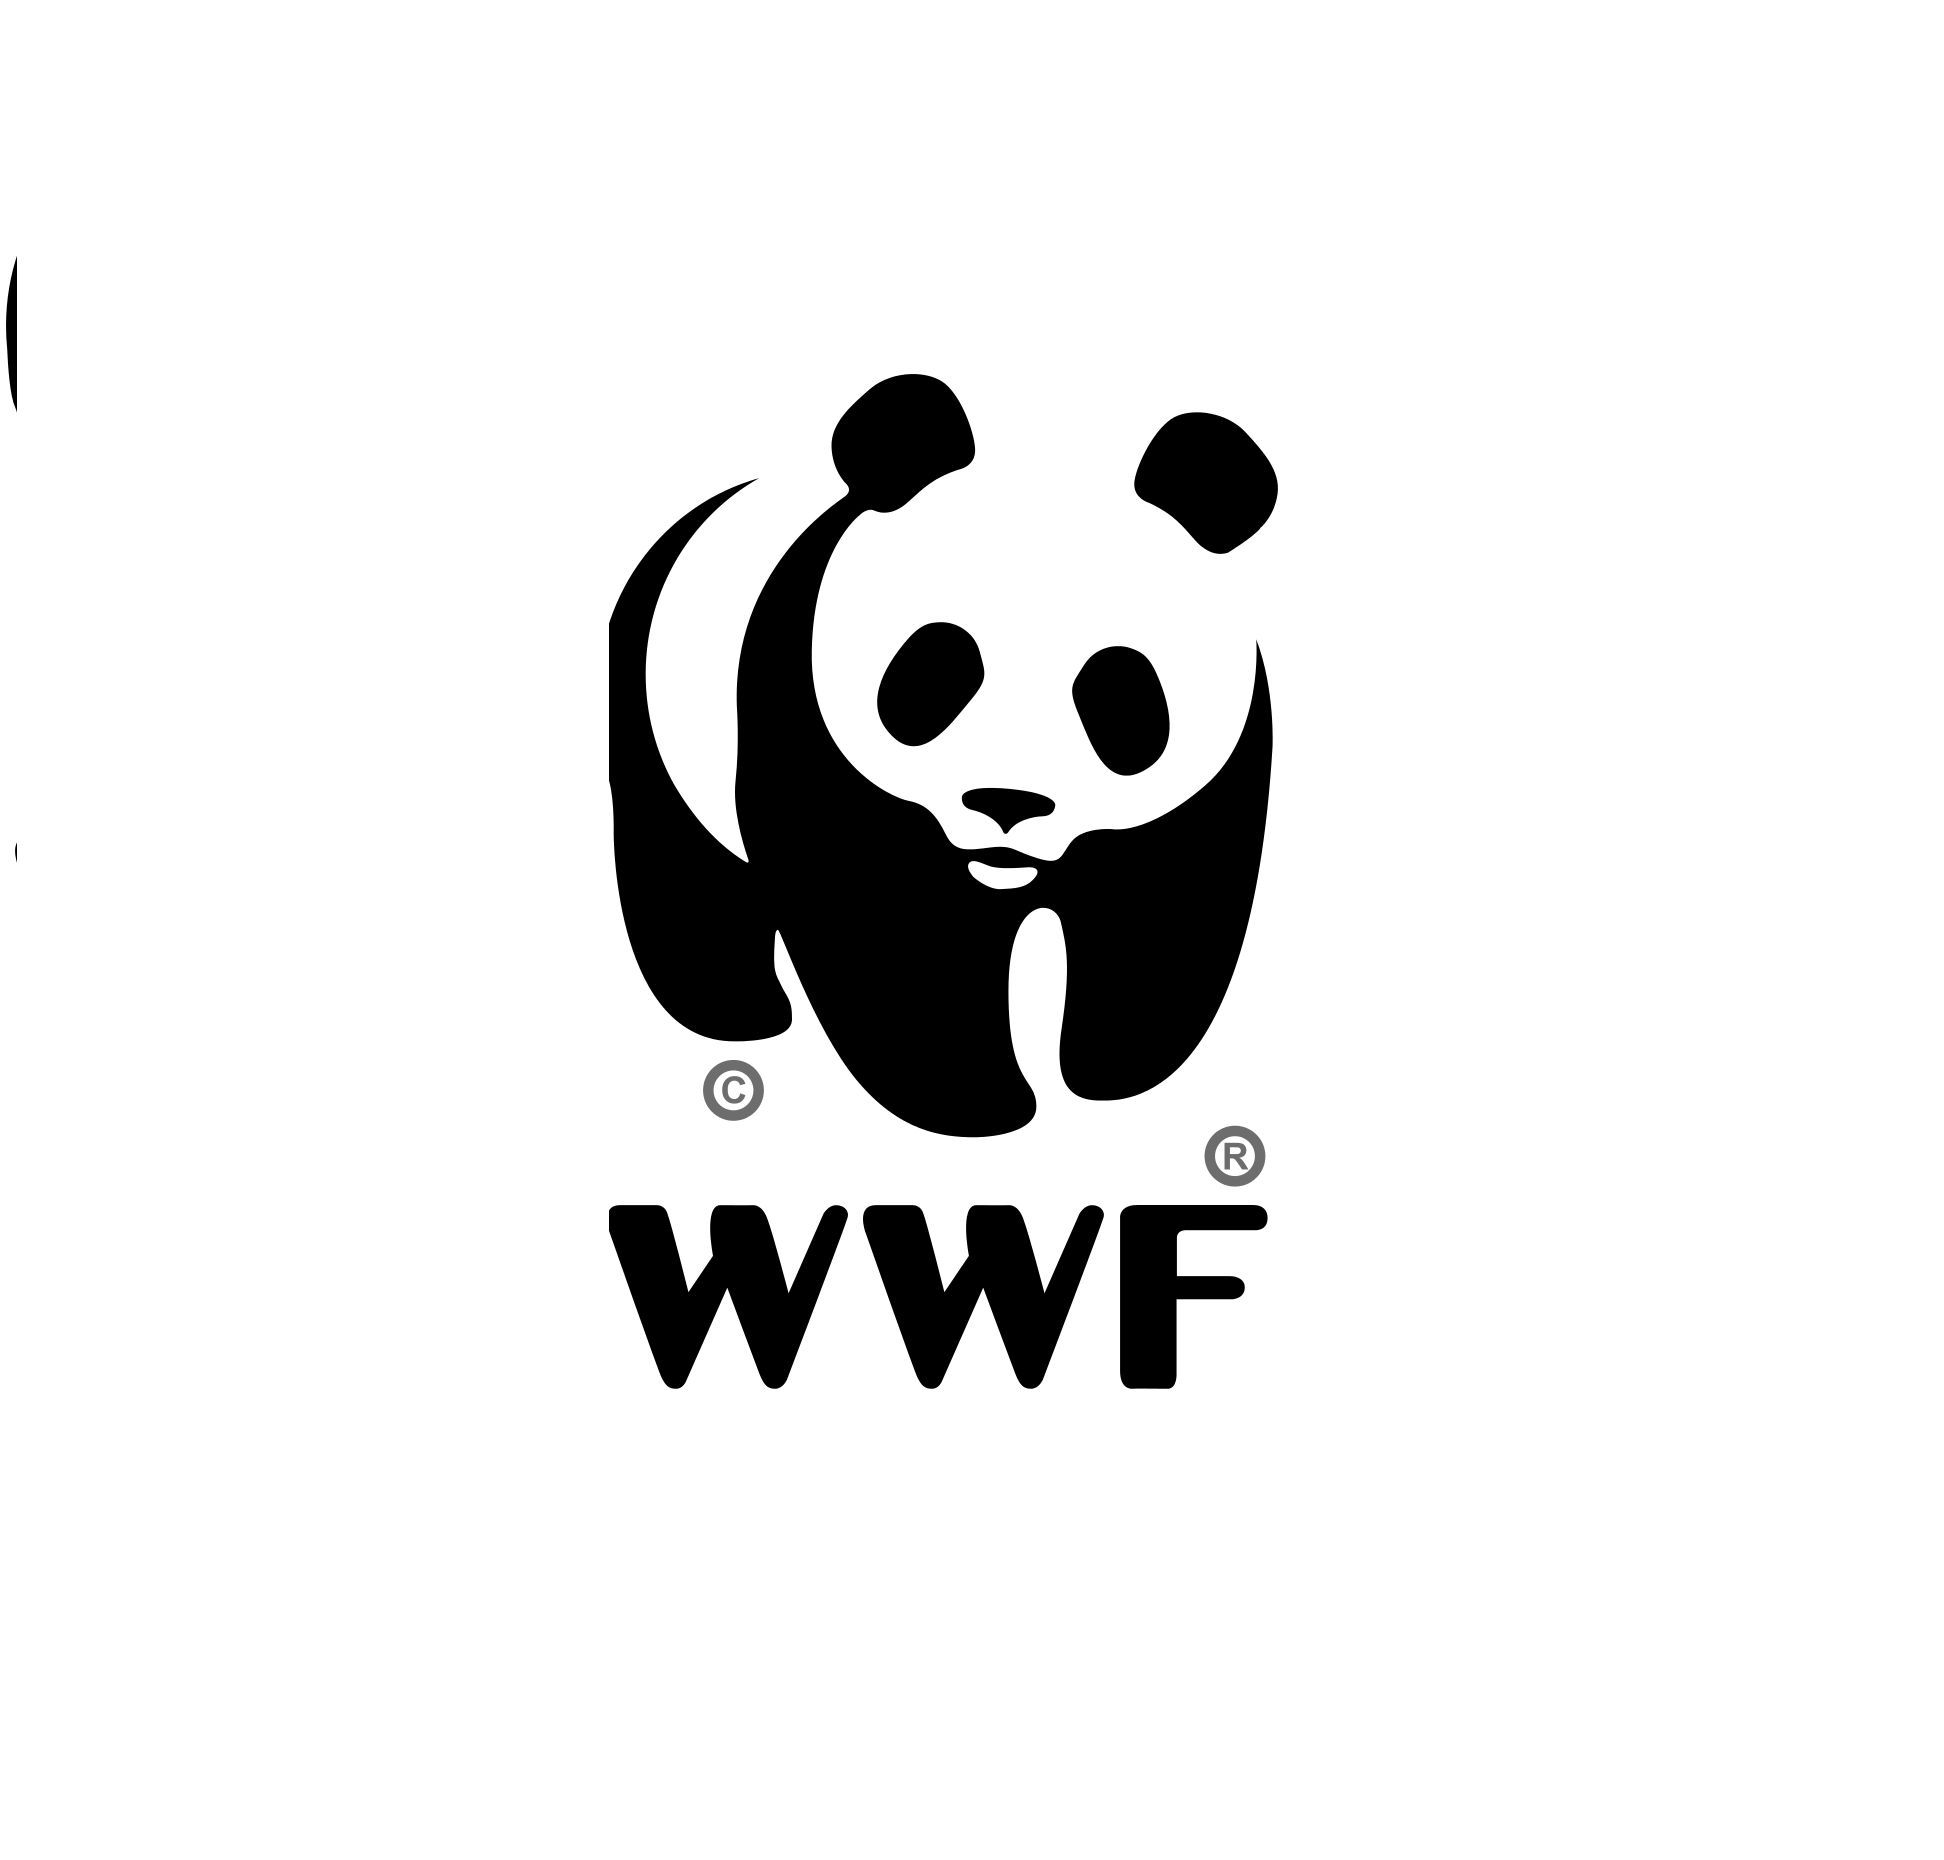 WWF_logo.svg